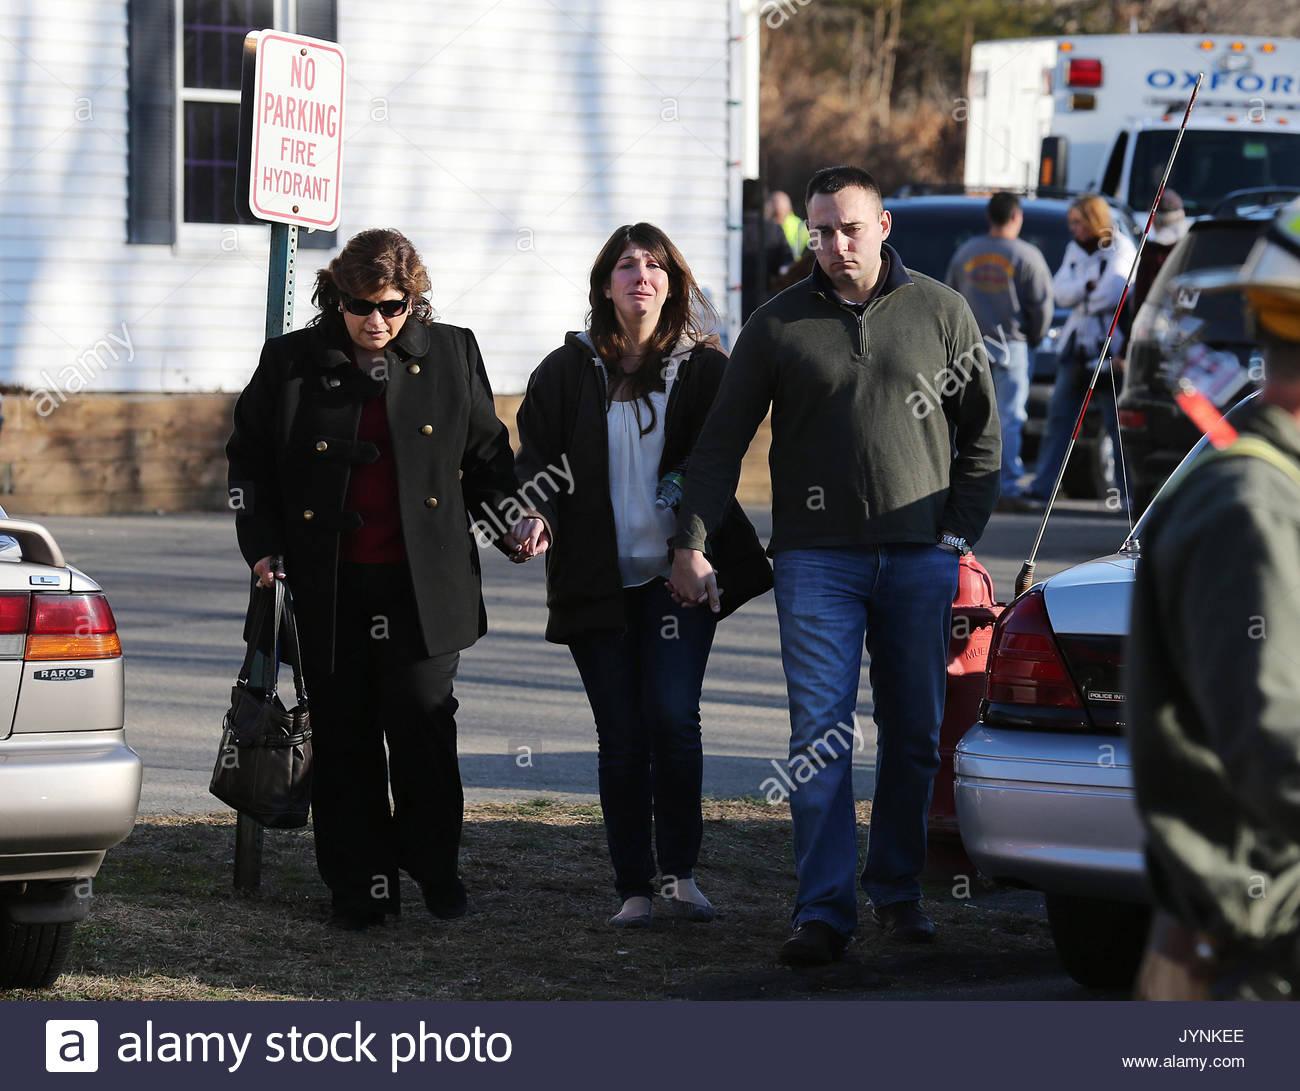 Fbi Releases Documents On 2012 Newtown School Shooting: Sandy Hook Elementary School Victims Stock Photos & Sandy